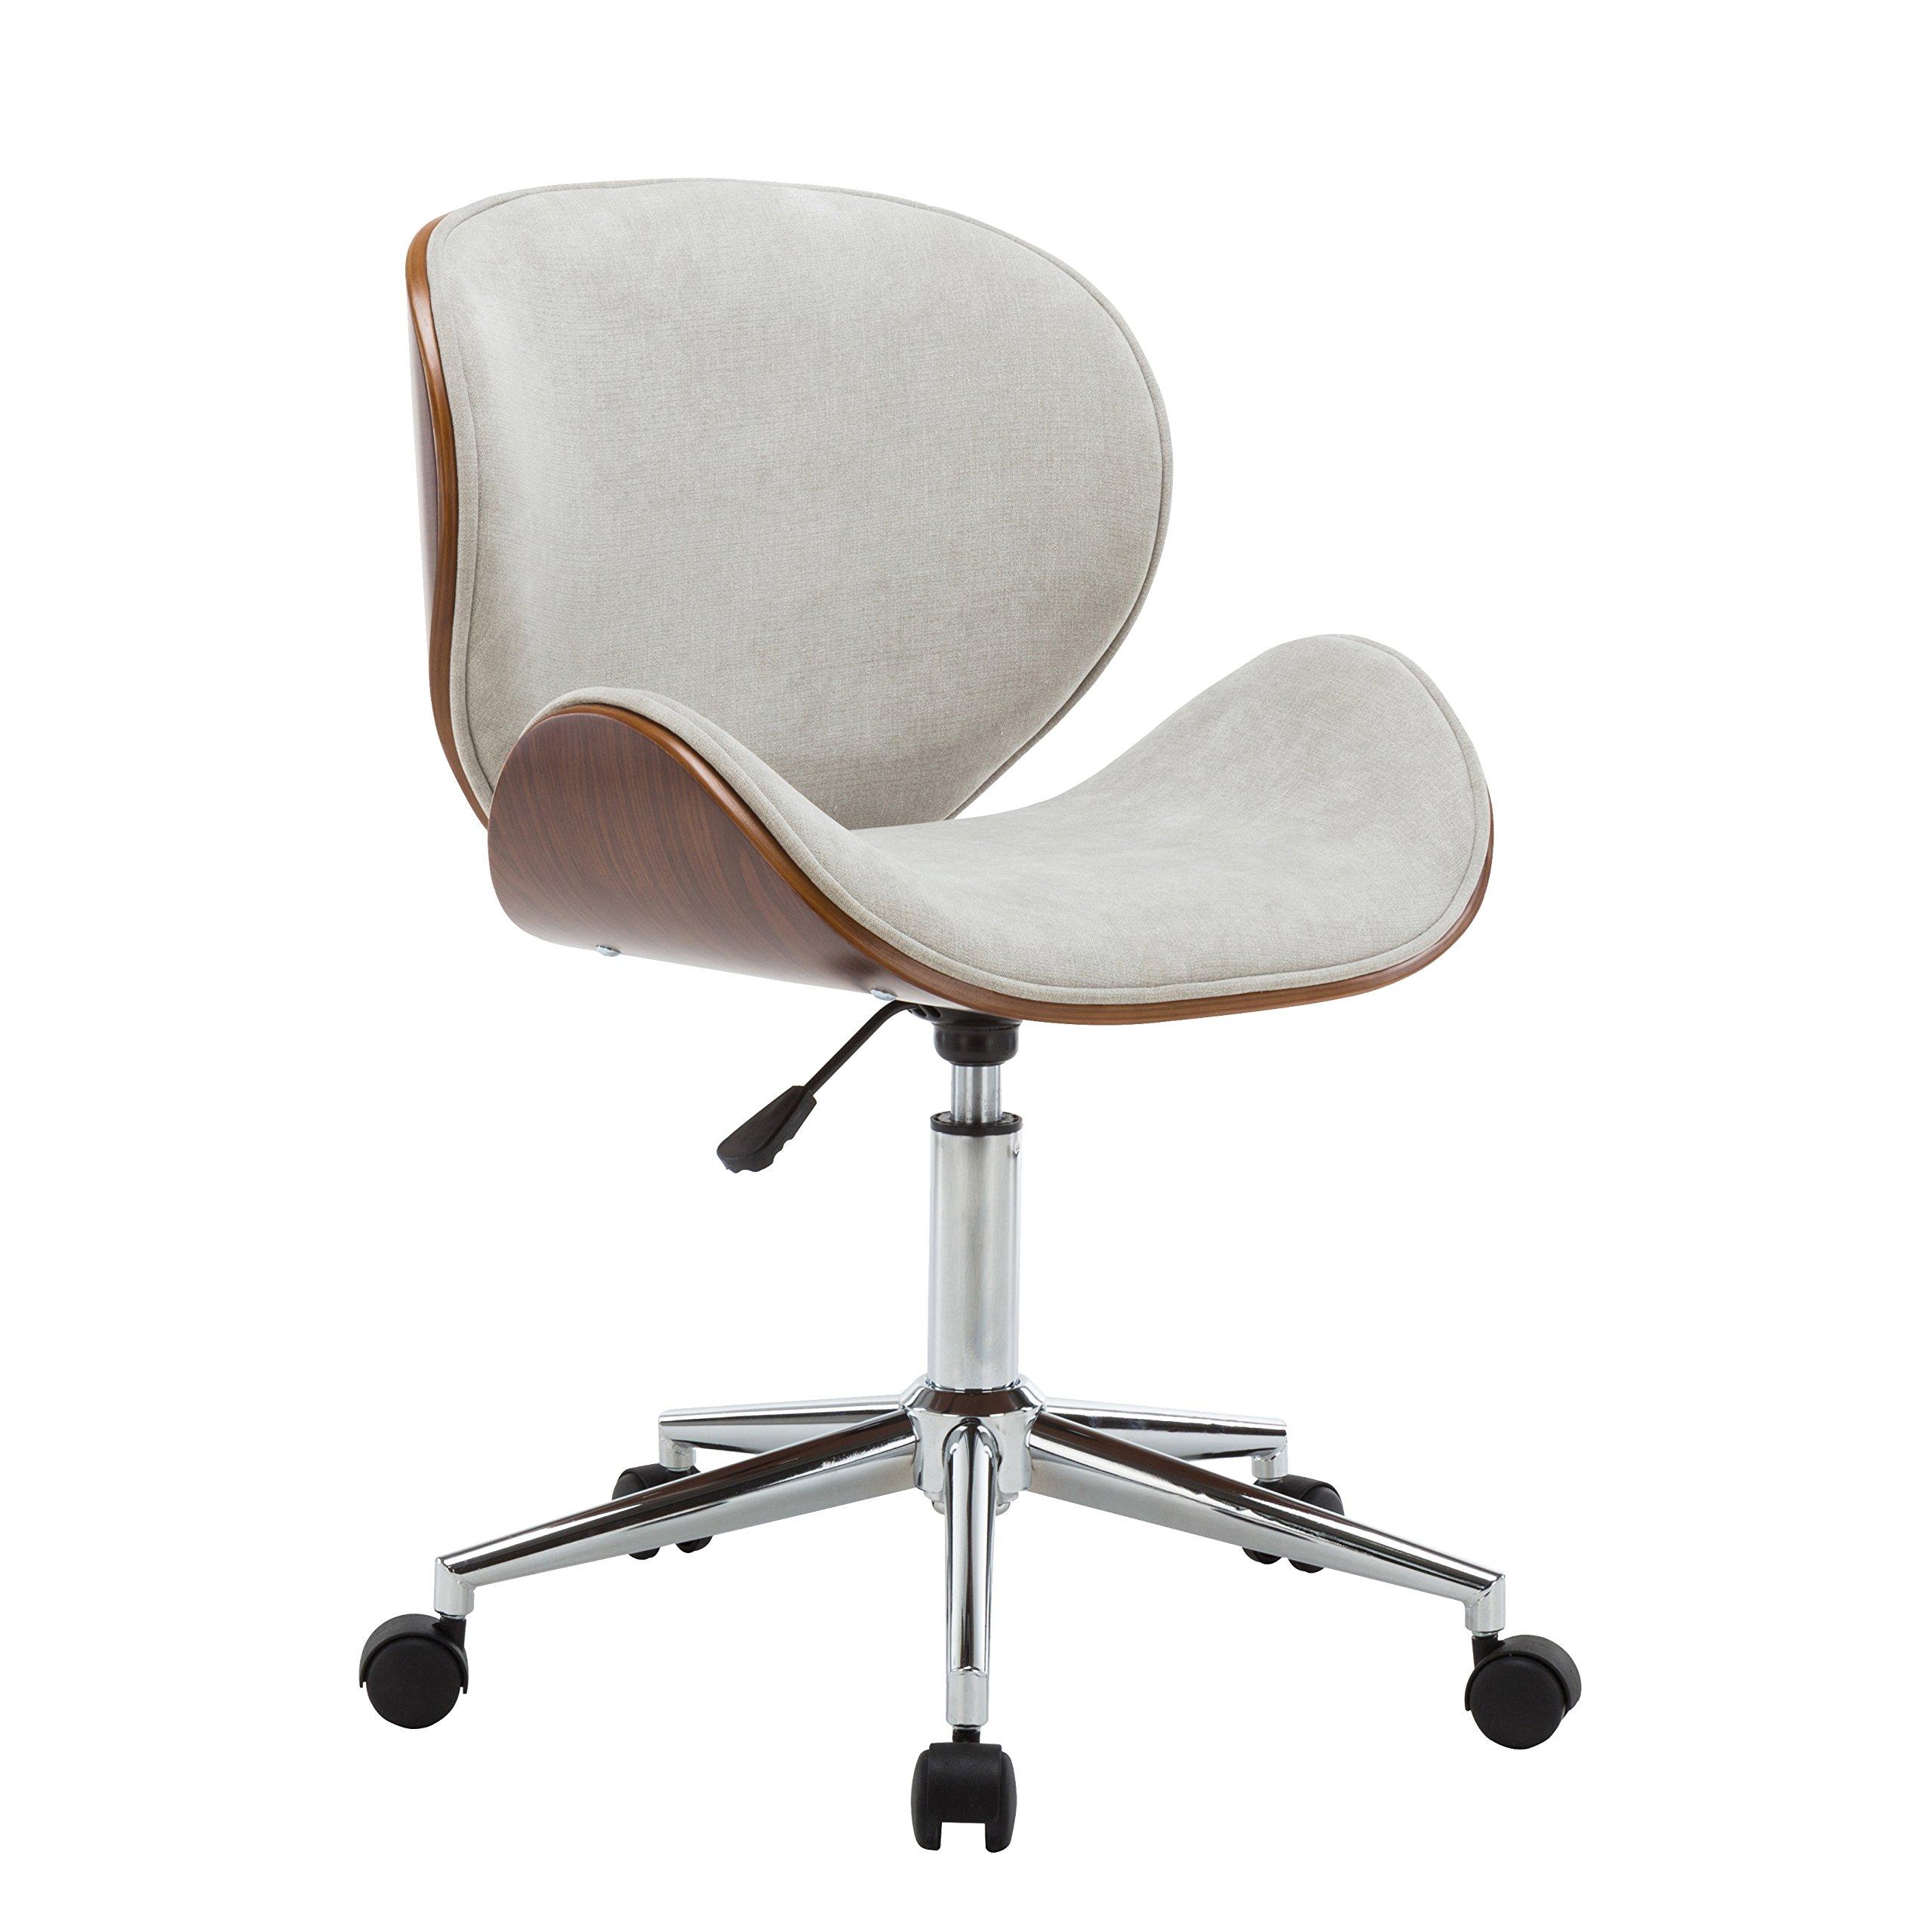 Porthos Home Branson Adjustable Office Chair , Cream